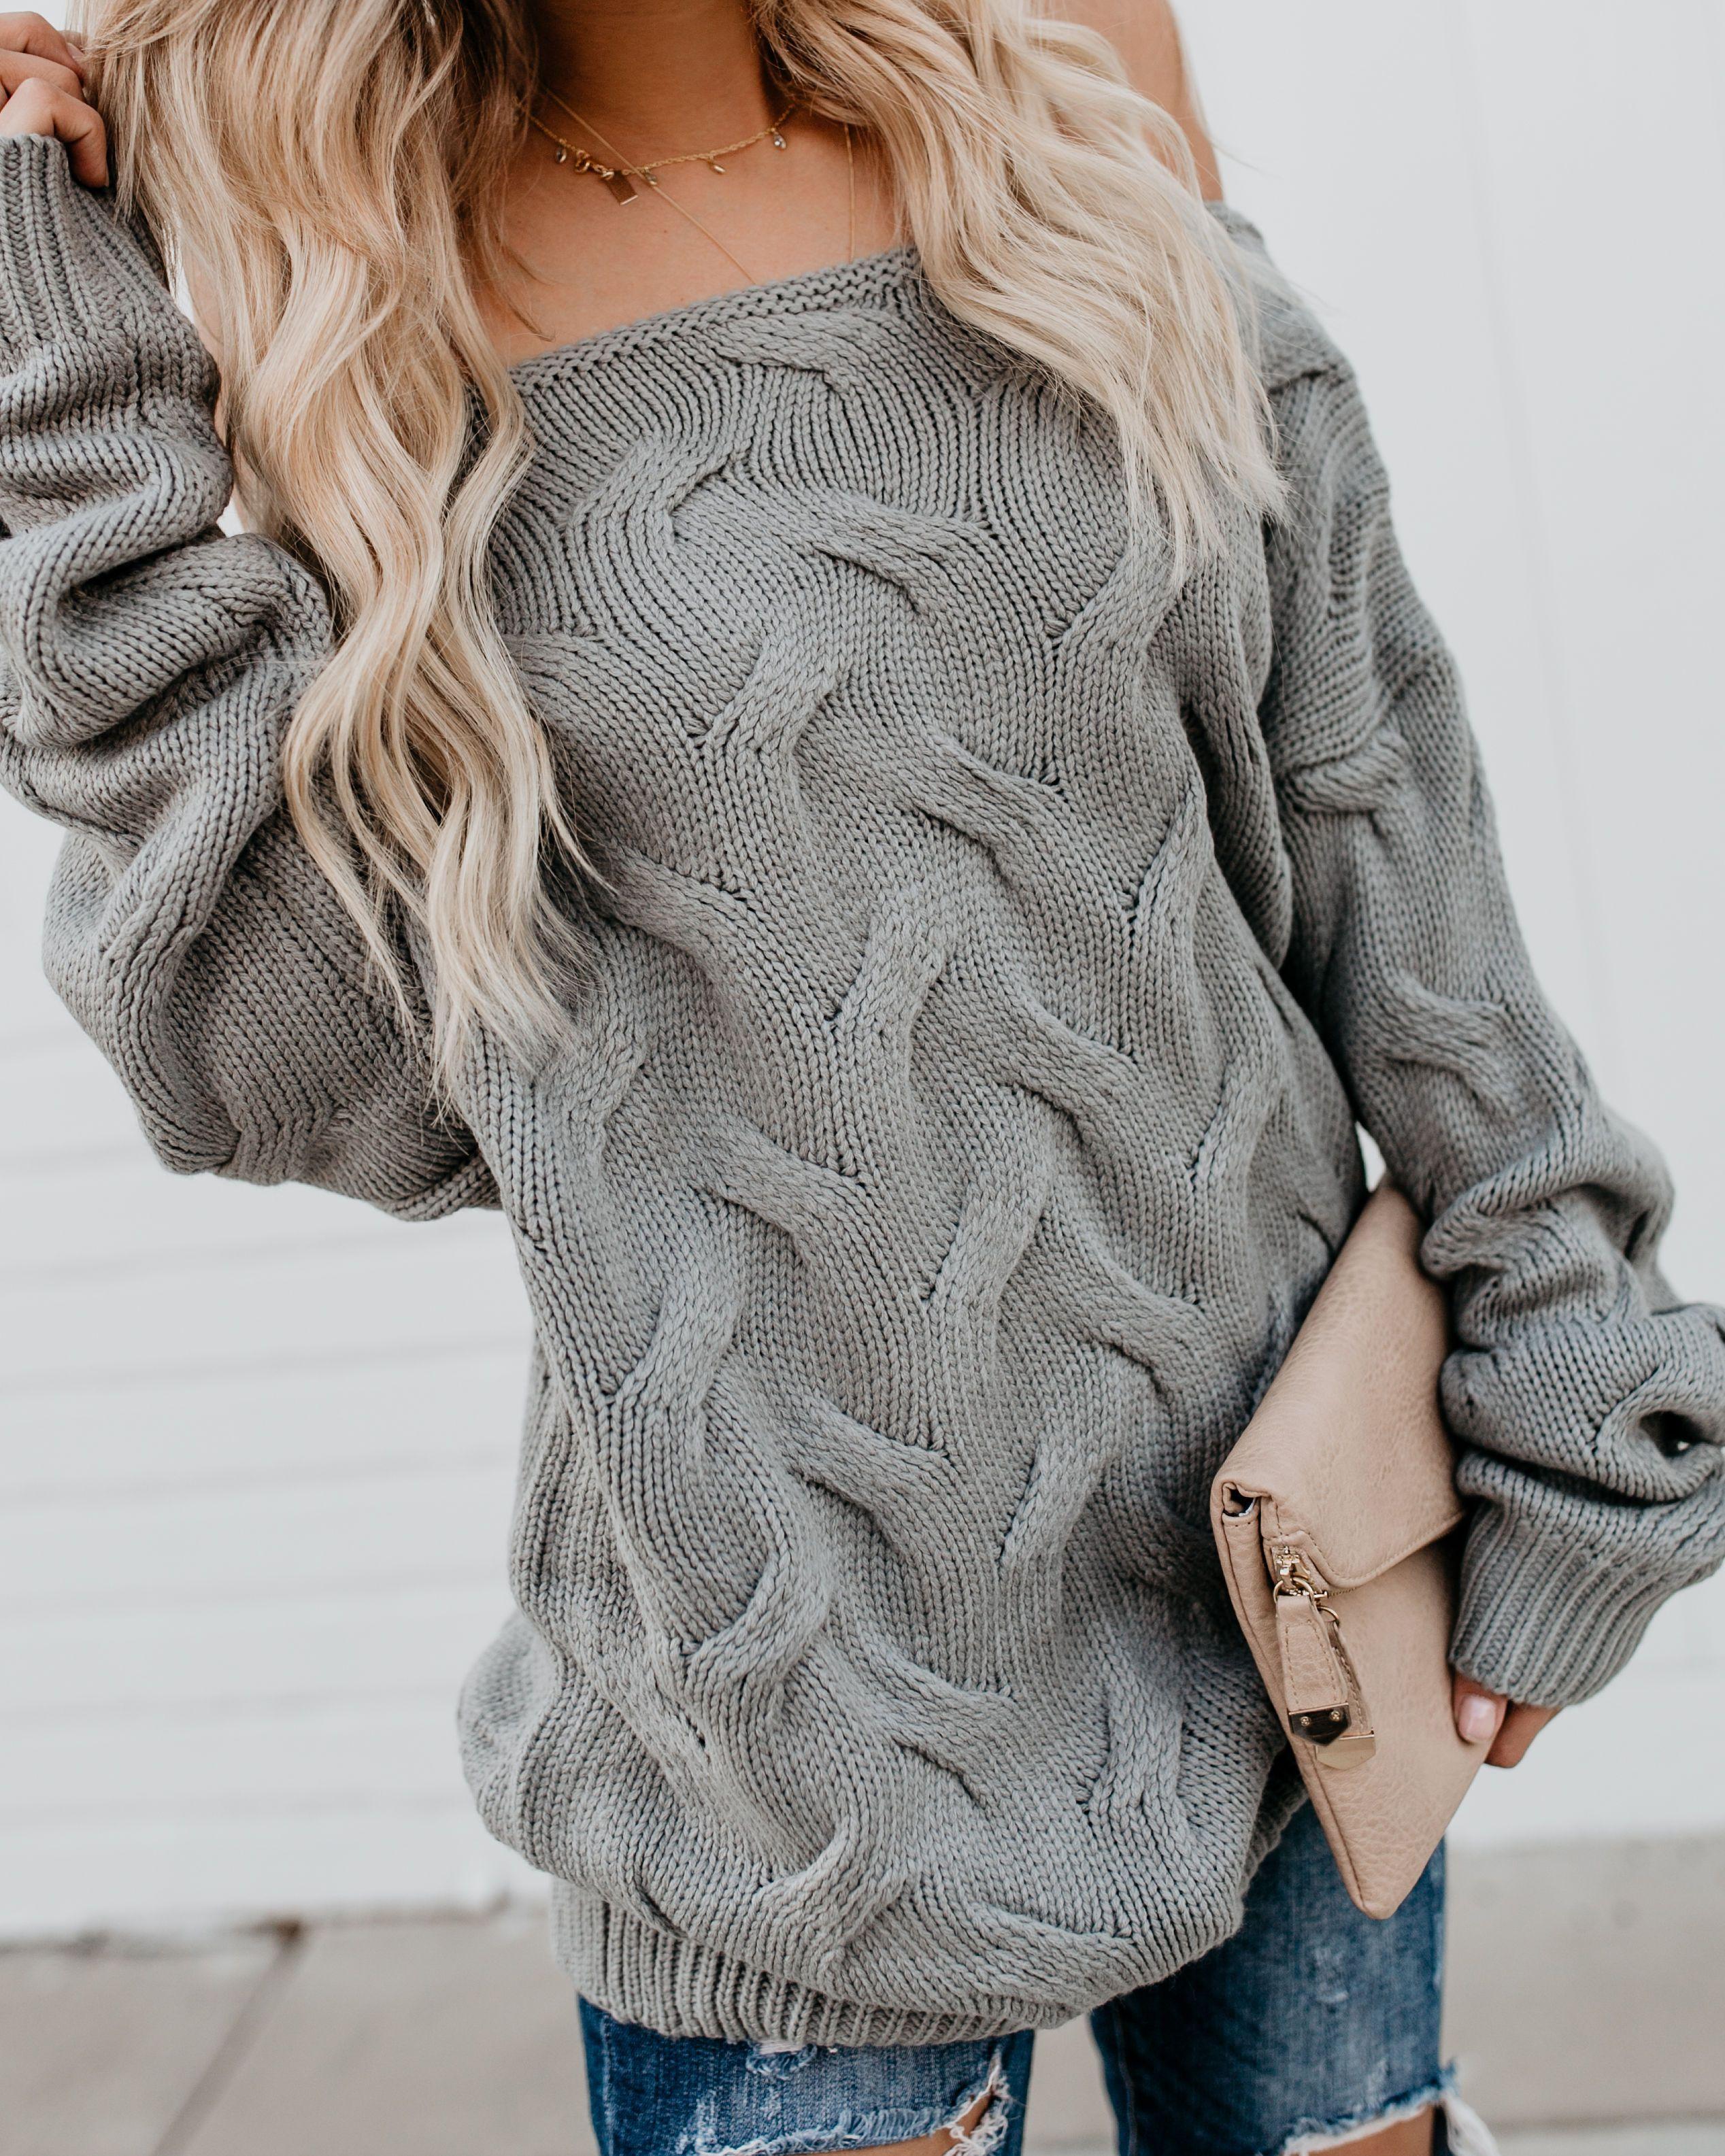 Nova Scotia Off The Shoulder Knit Sweater Sweaters women